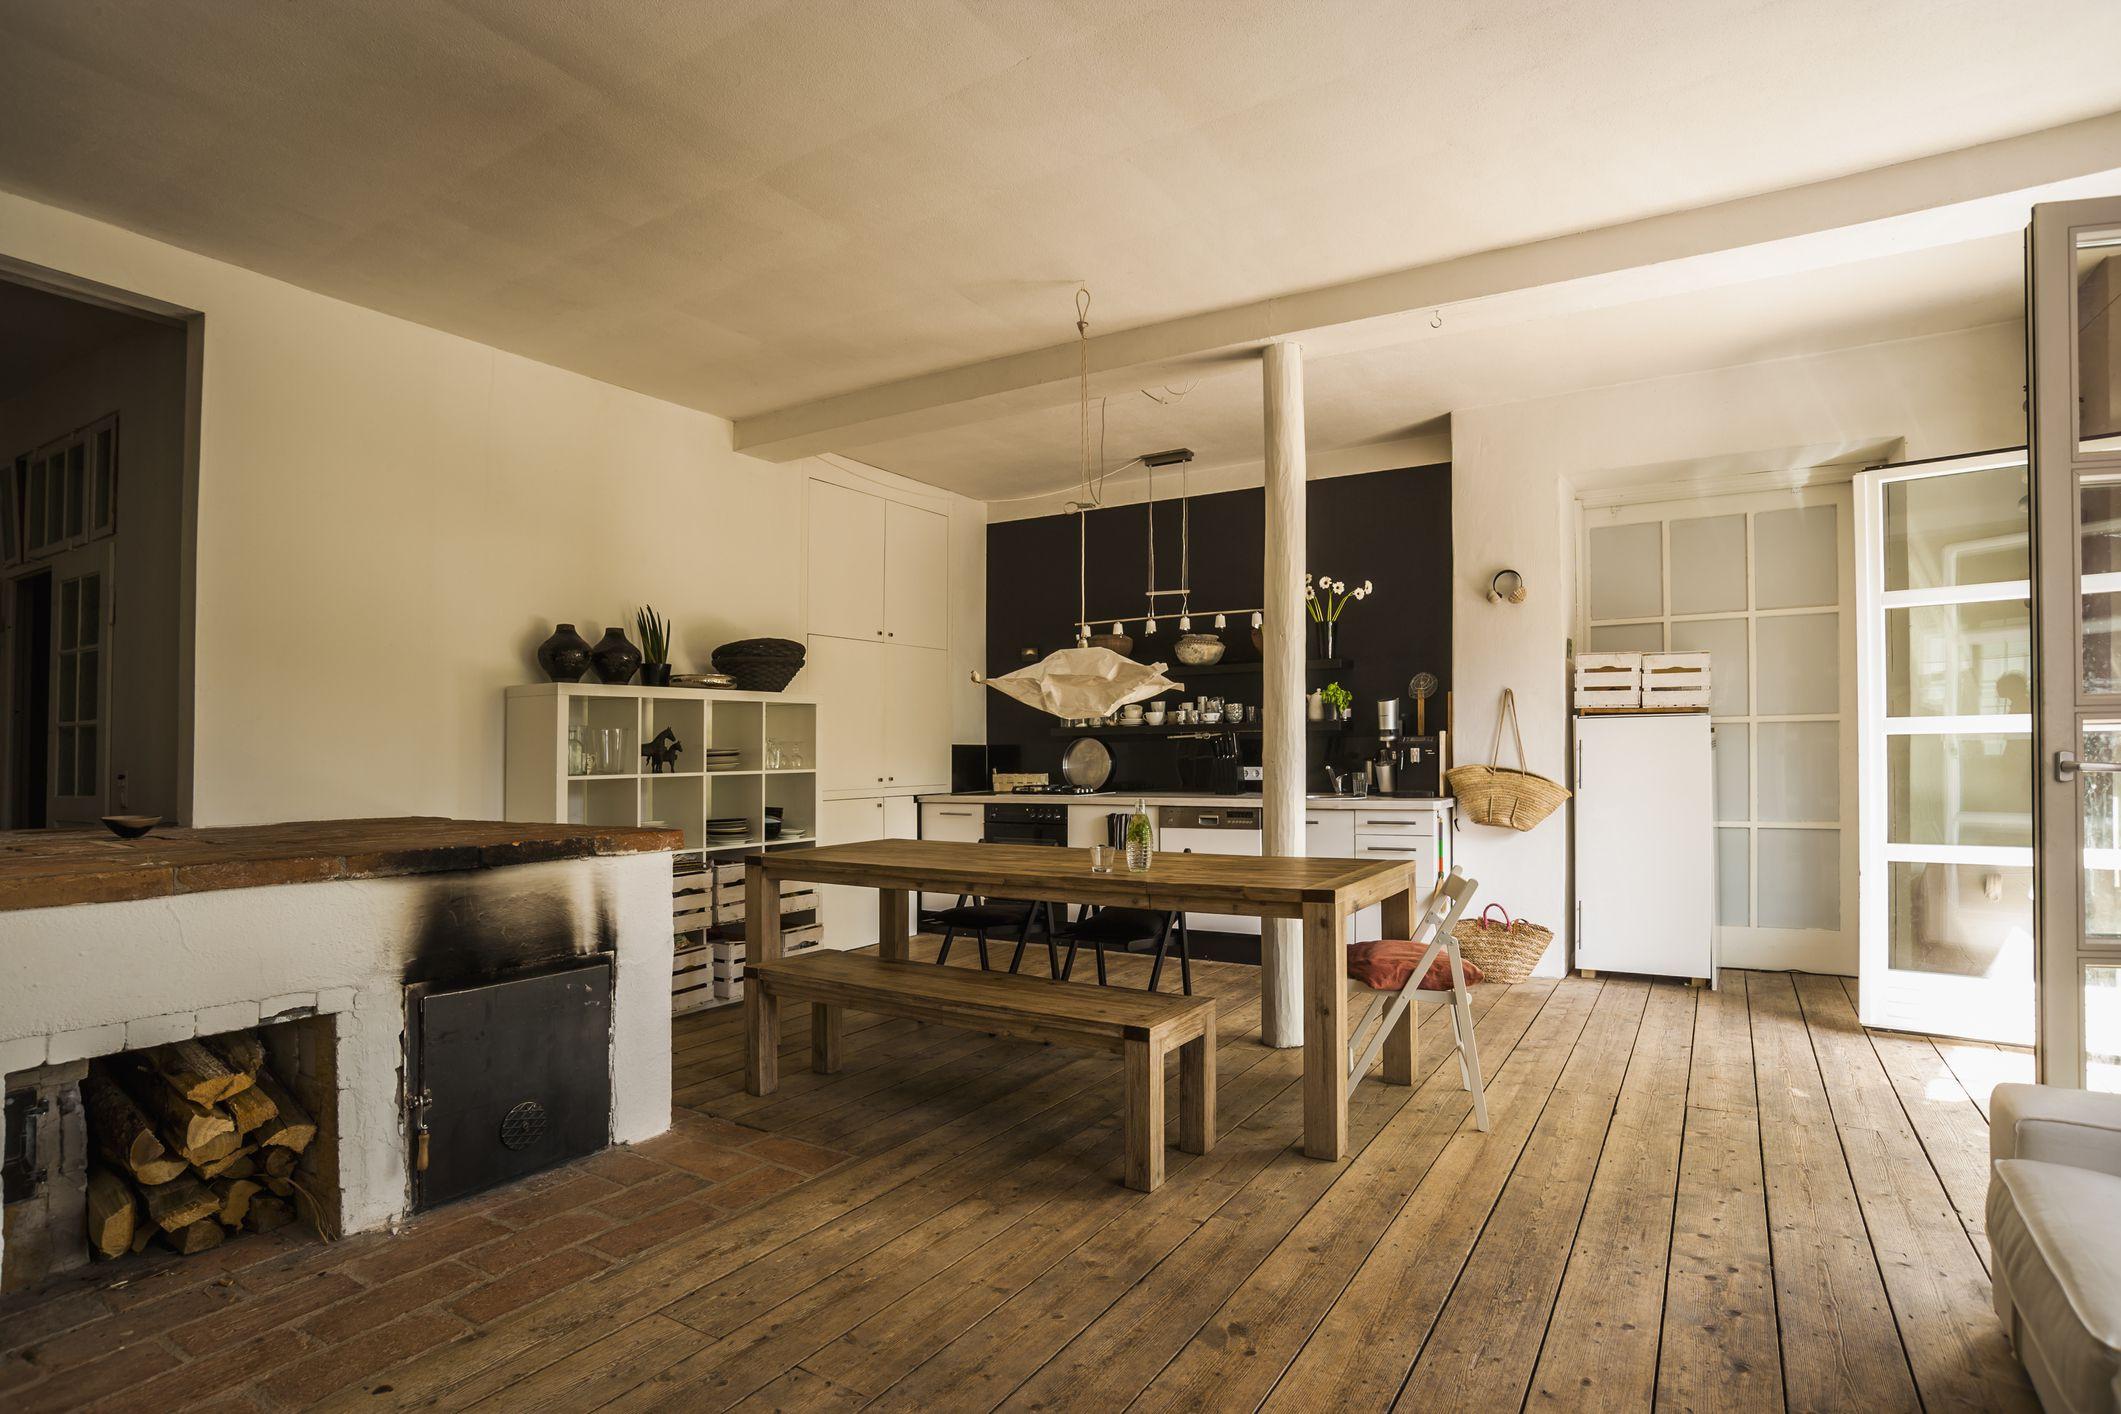 maple hardwood flooring colors of vinyl wood flooring versus natural hardwood with regard to diningroom woodenfloor gettyimages 544546775 590e57565f9b58647043440a